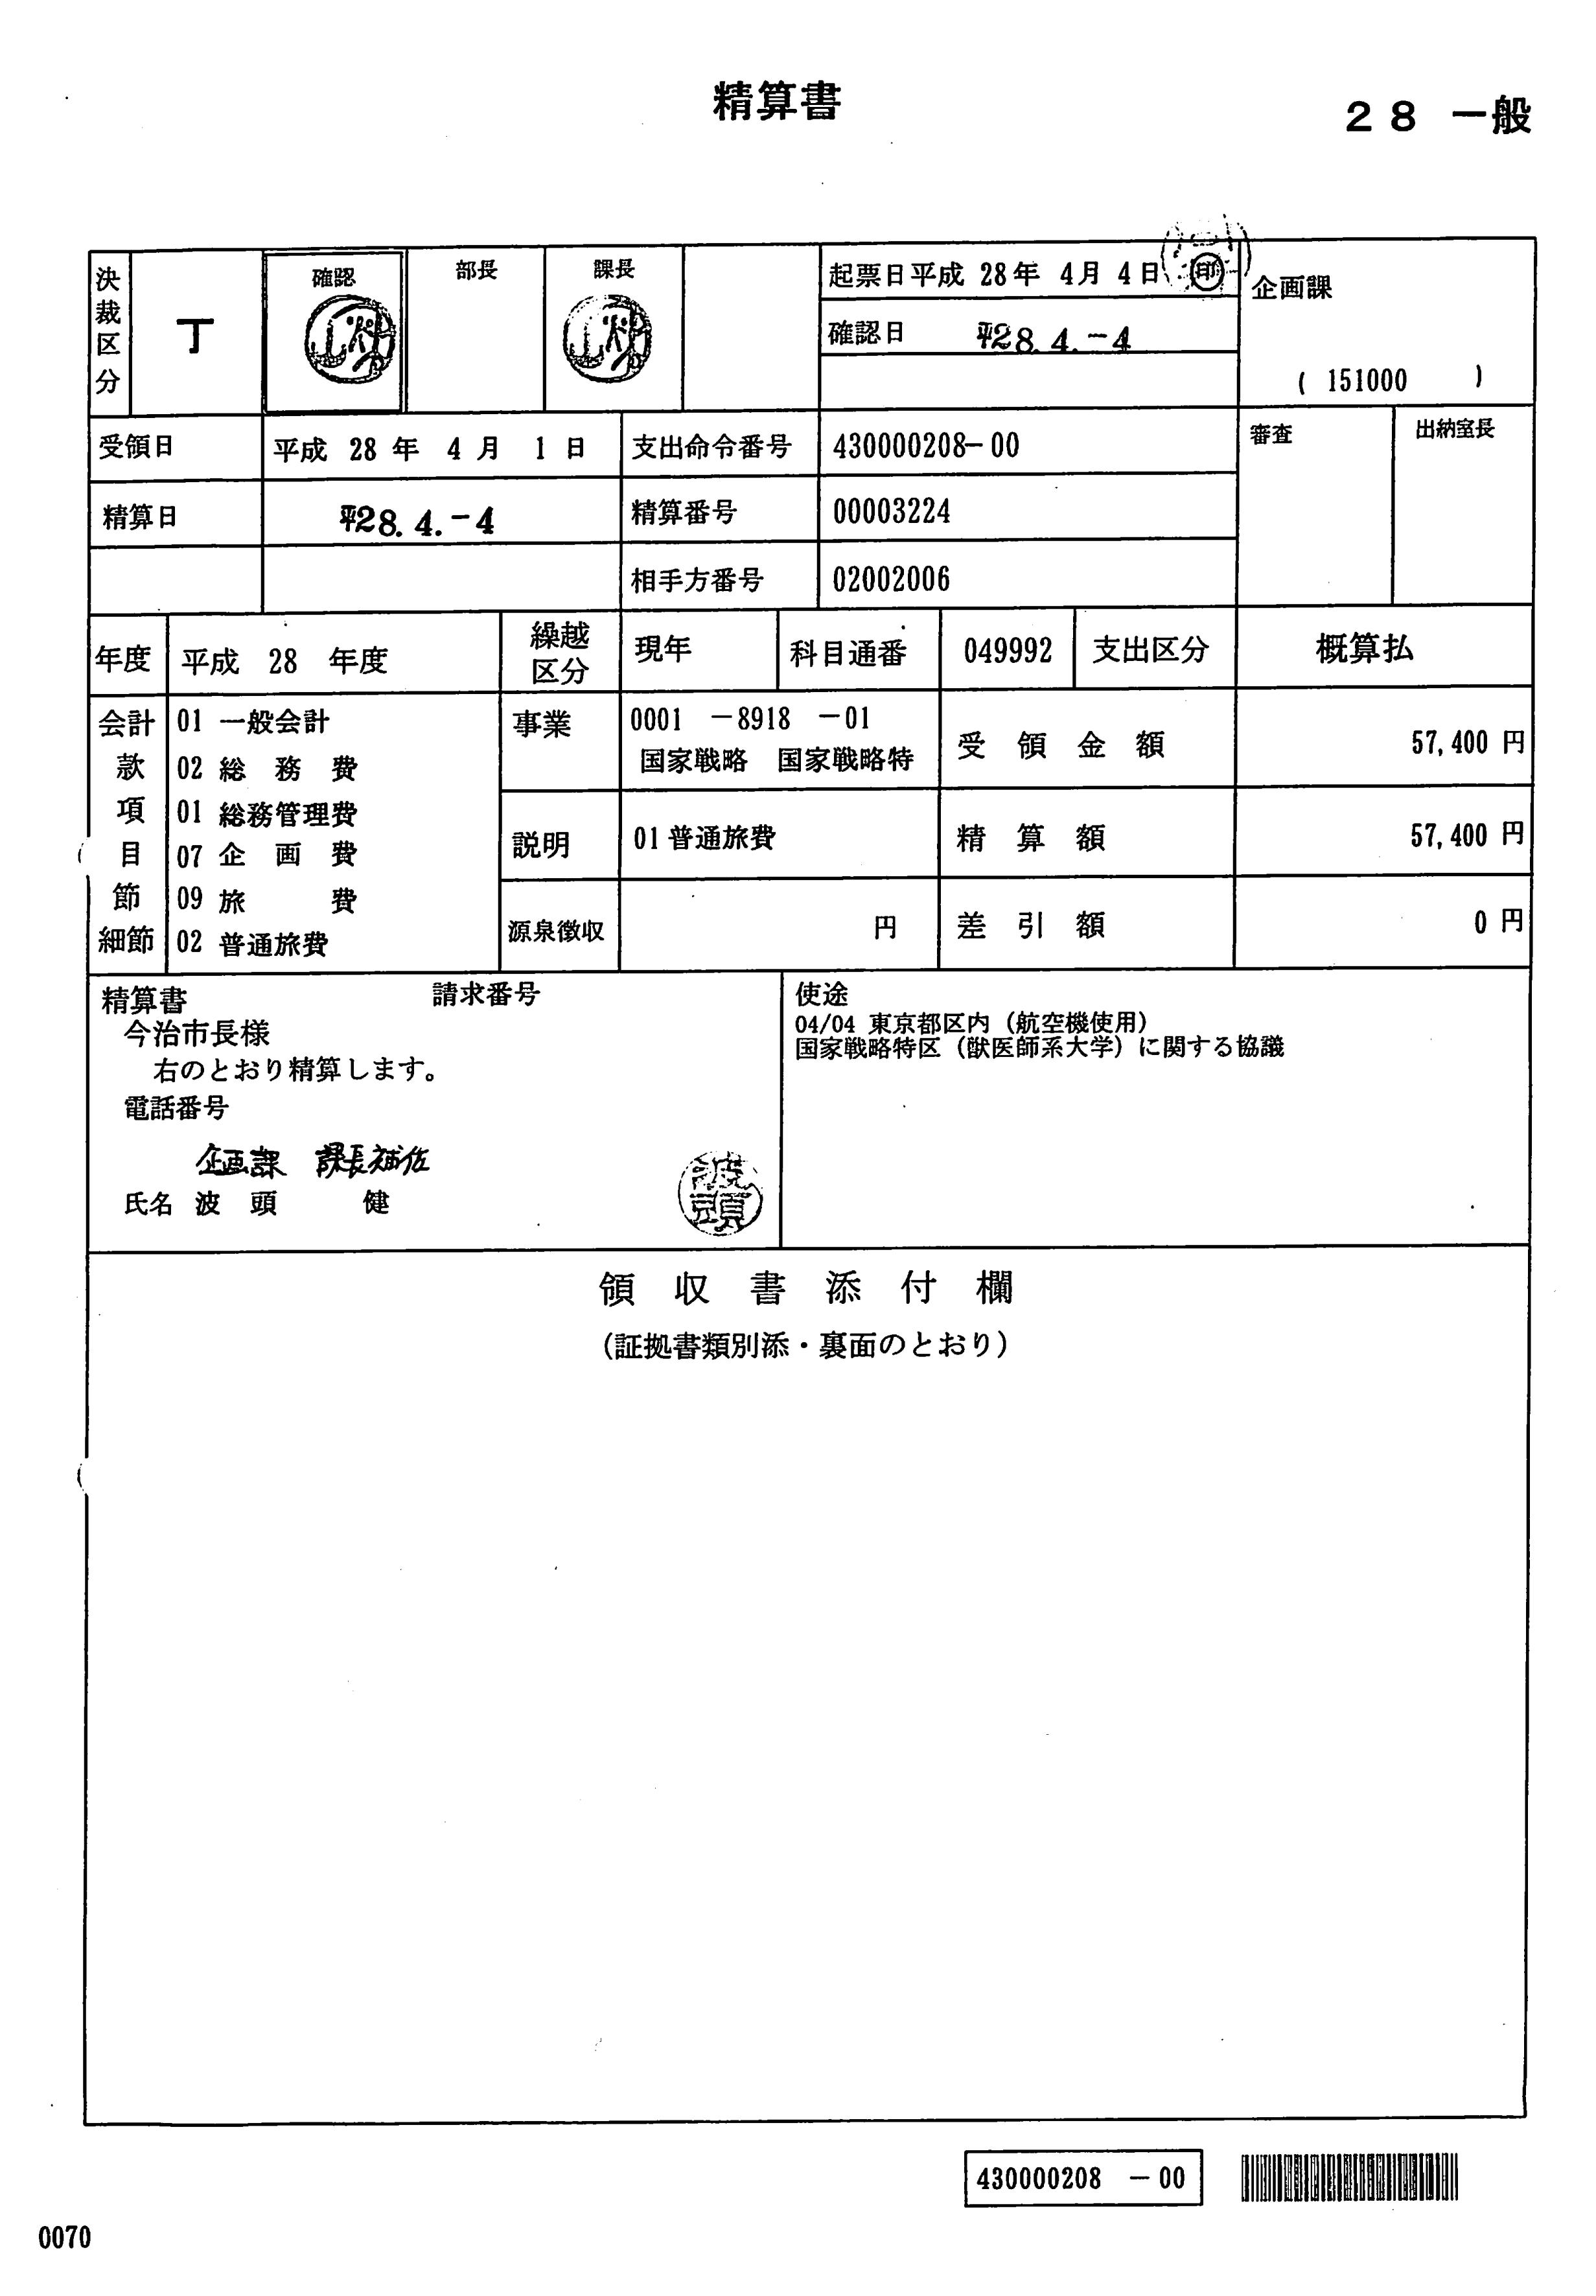 今治市 20160404東京出張 国家戦略特区(大学獣医学部の誘致等)に関する協議 (2)